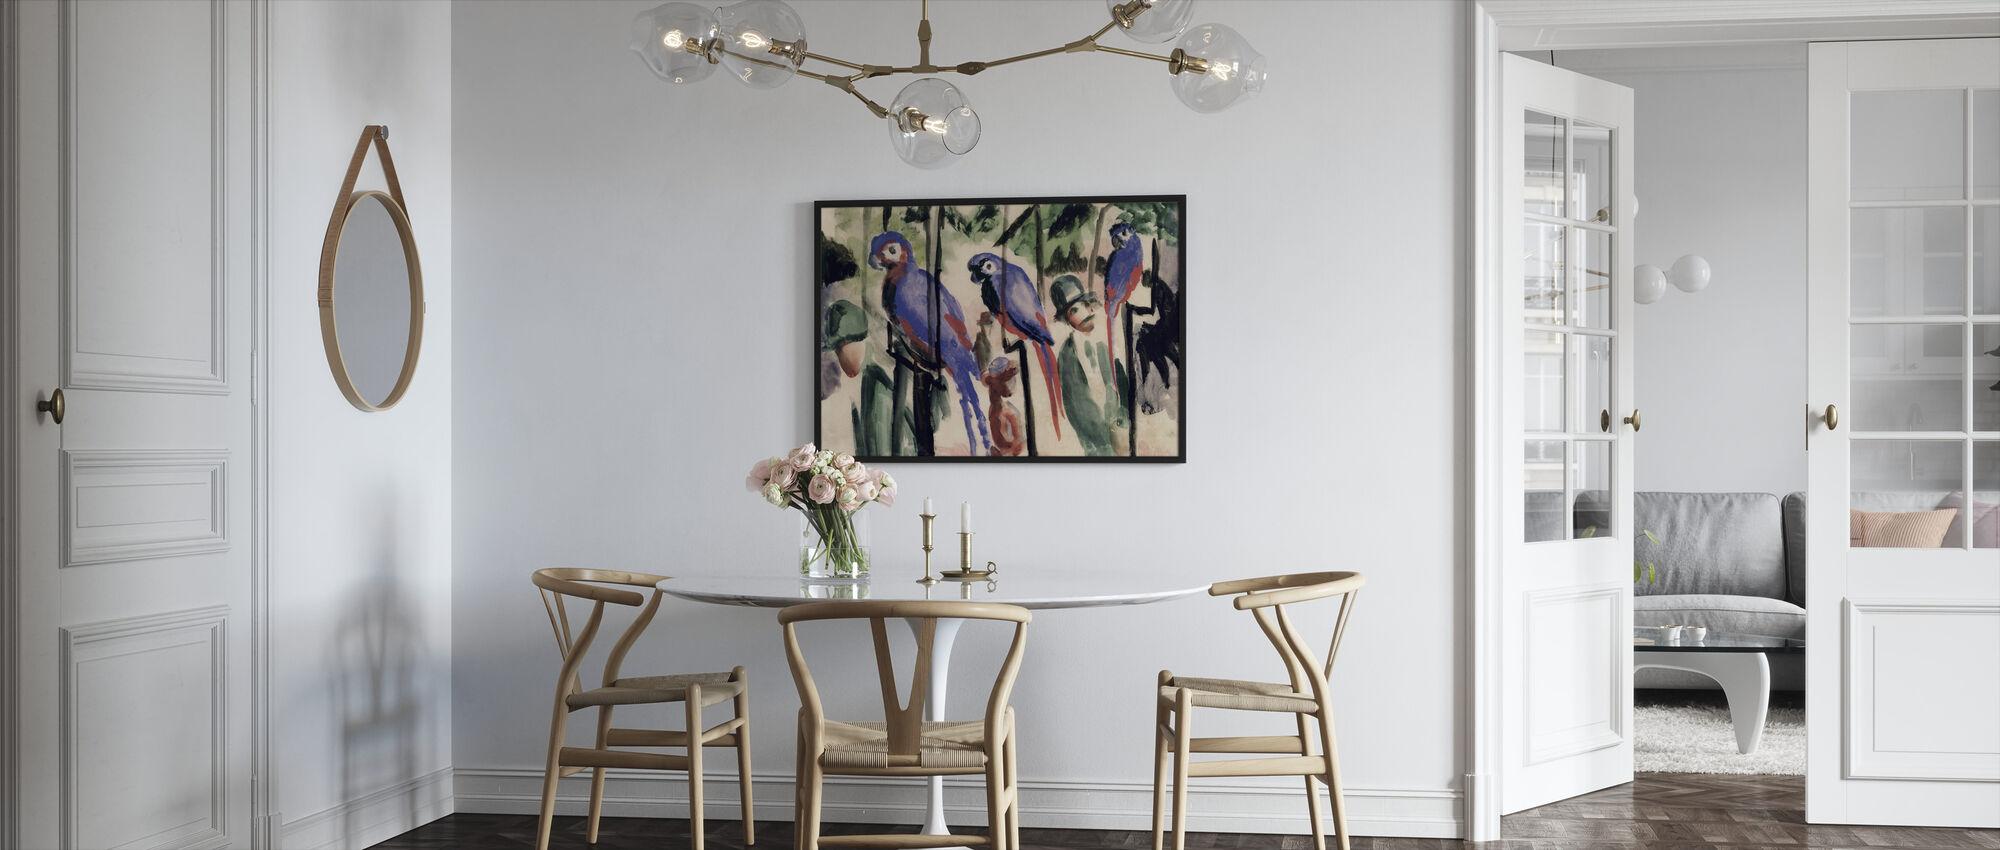 Blue Parrots - August Macke - Framed print - Kitchen